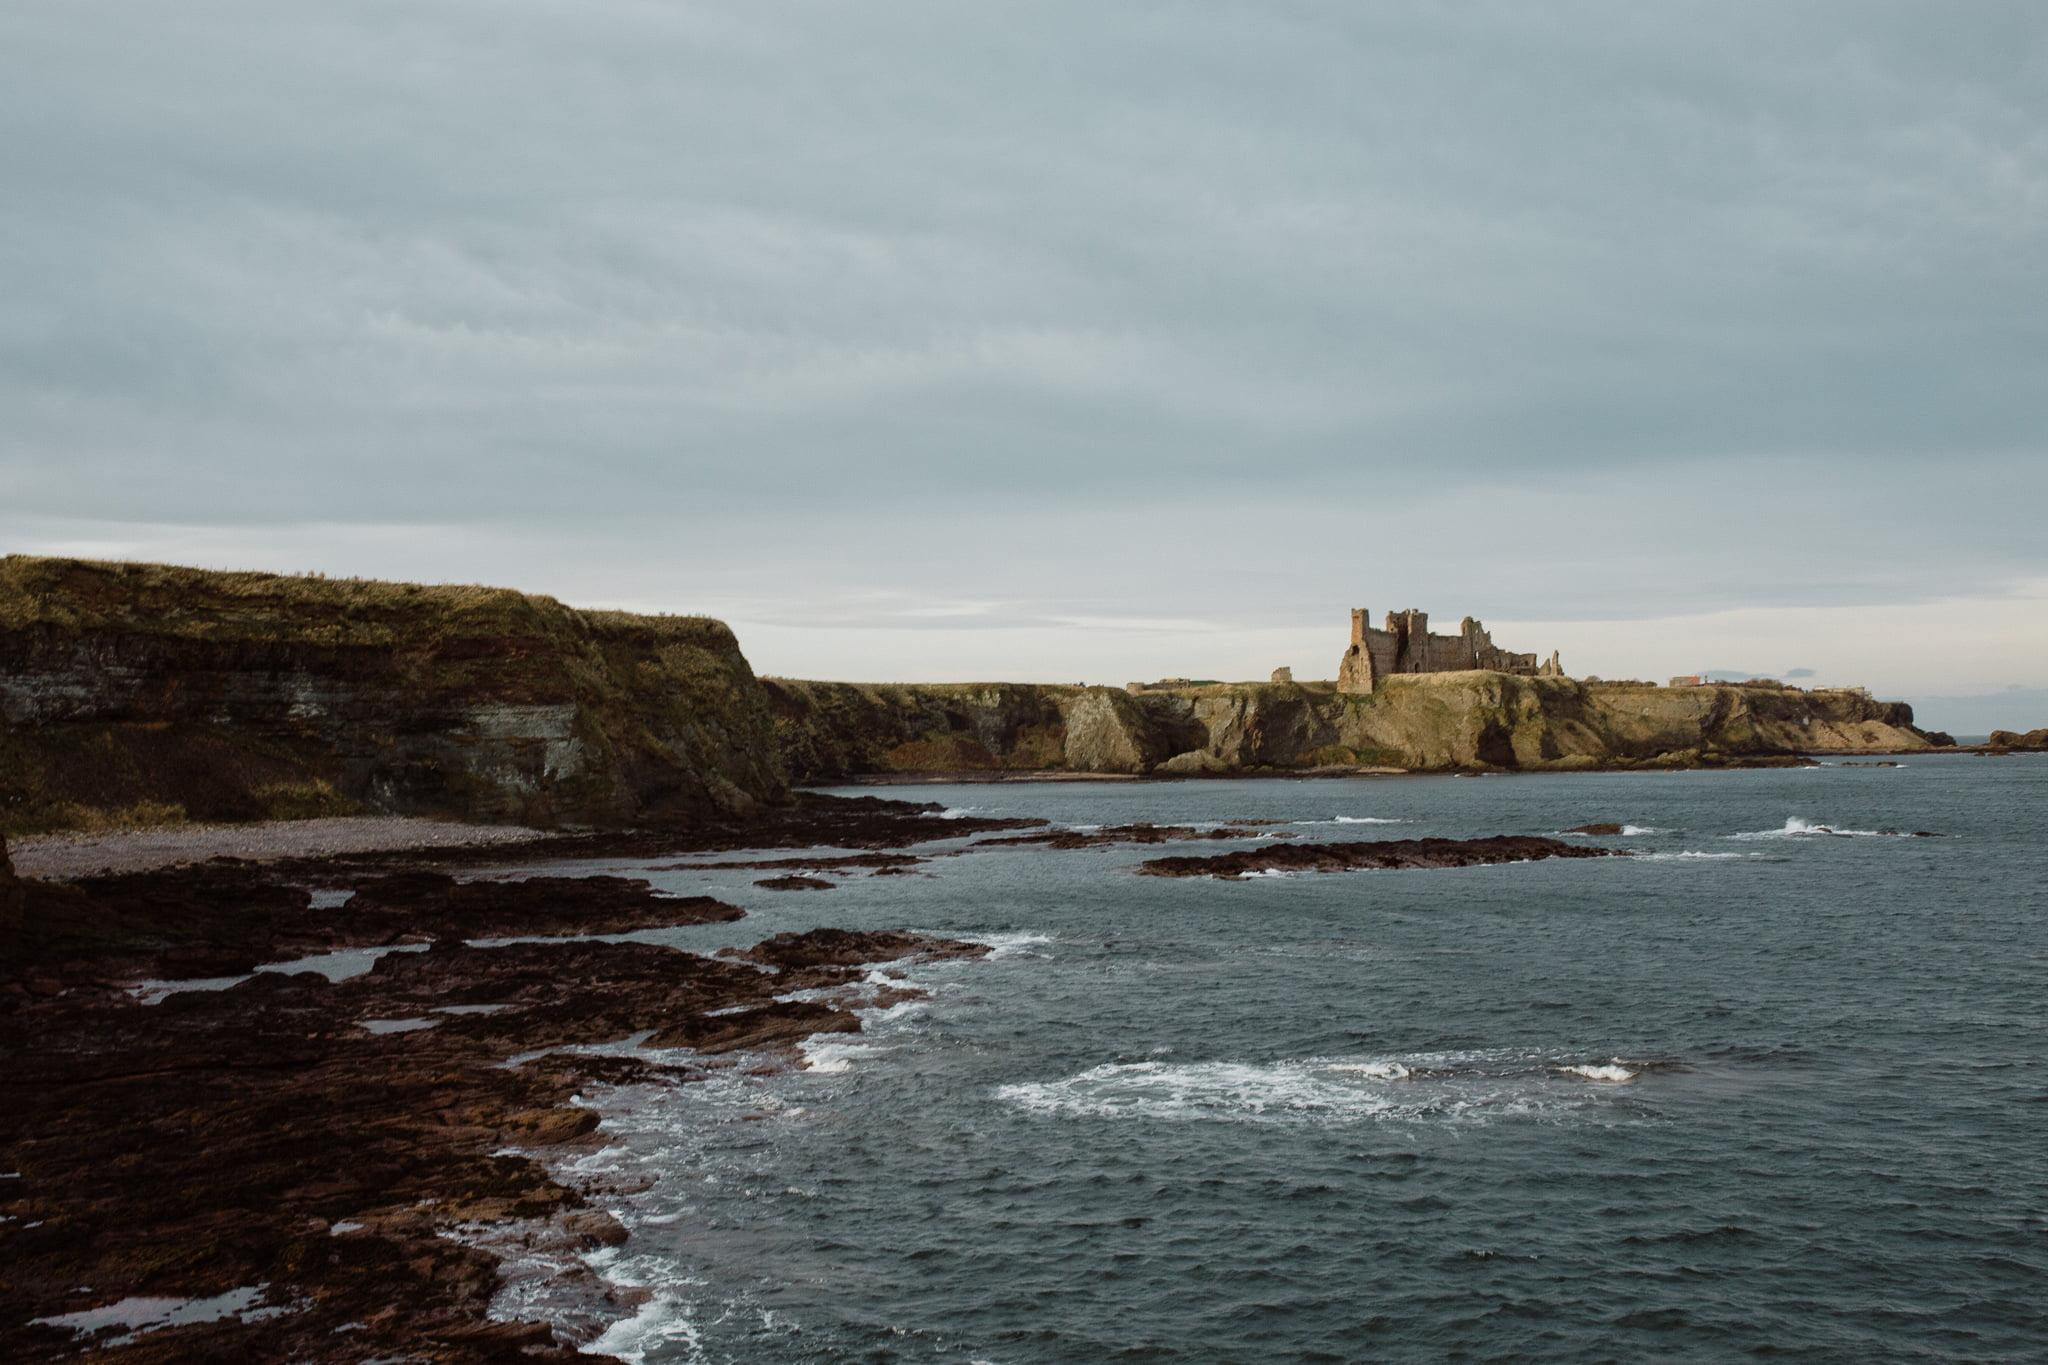 Scotland Wedding Photographer - Tantallon Castle, Bamburgh Castle, Holy Island 1